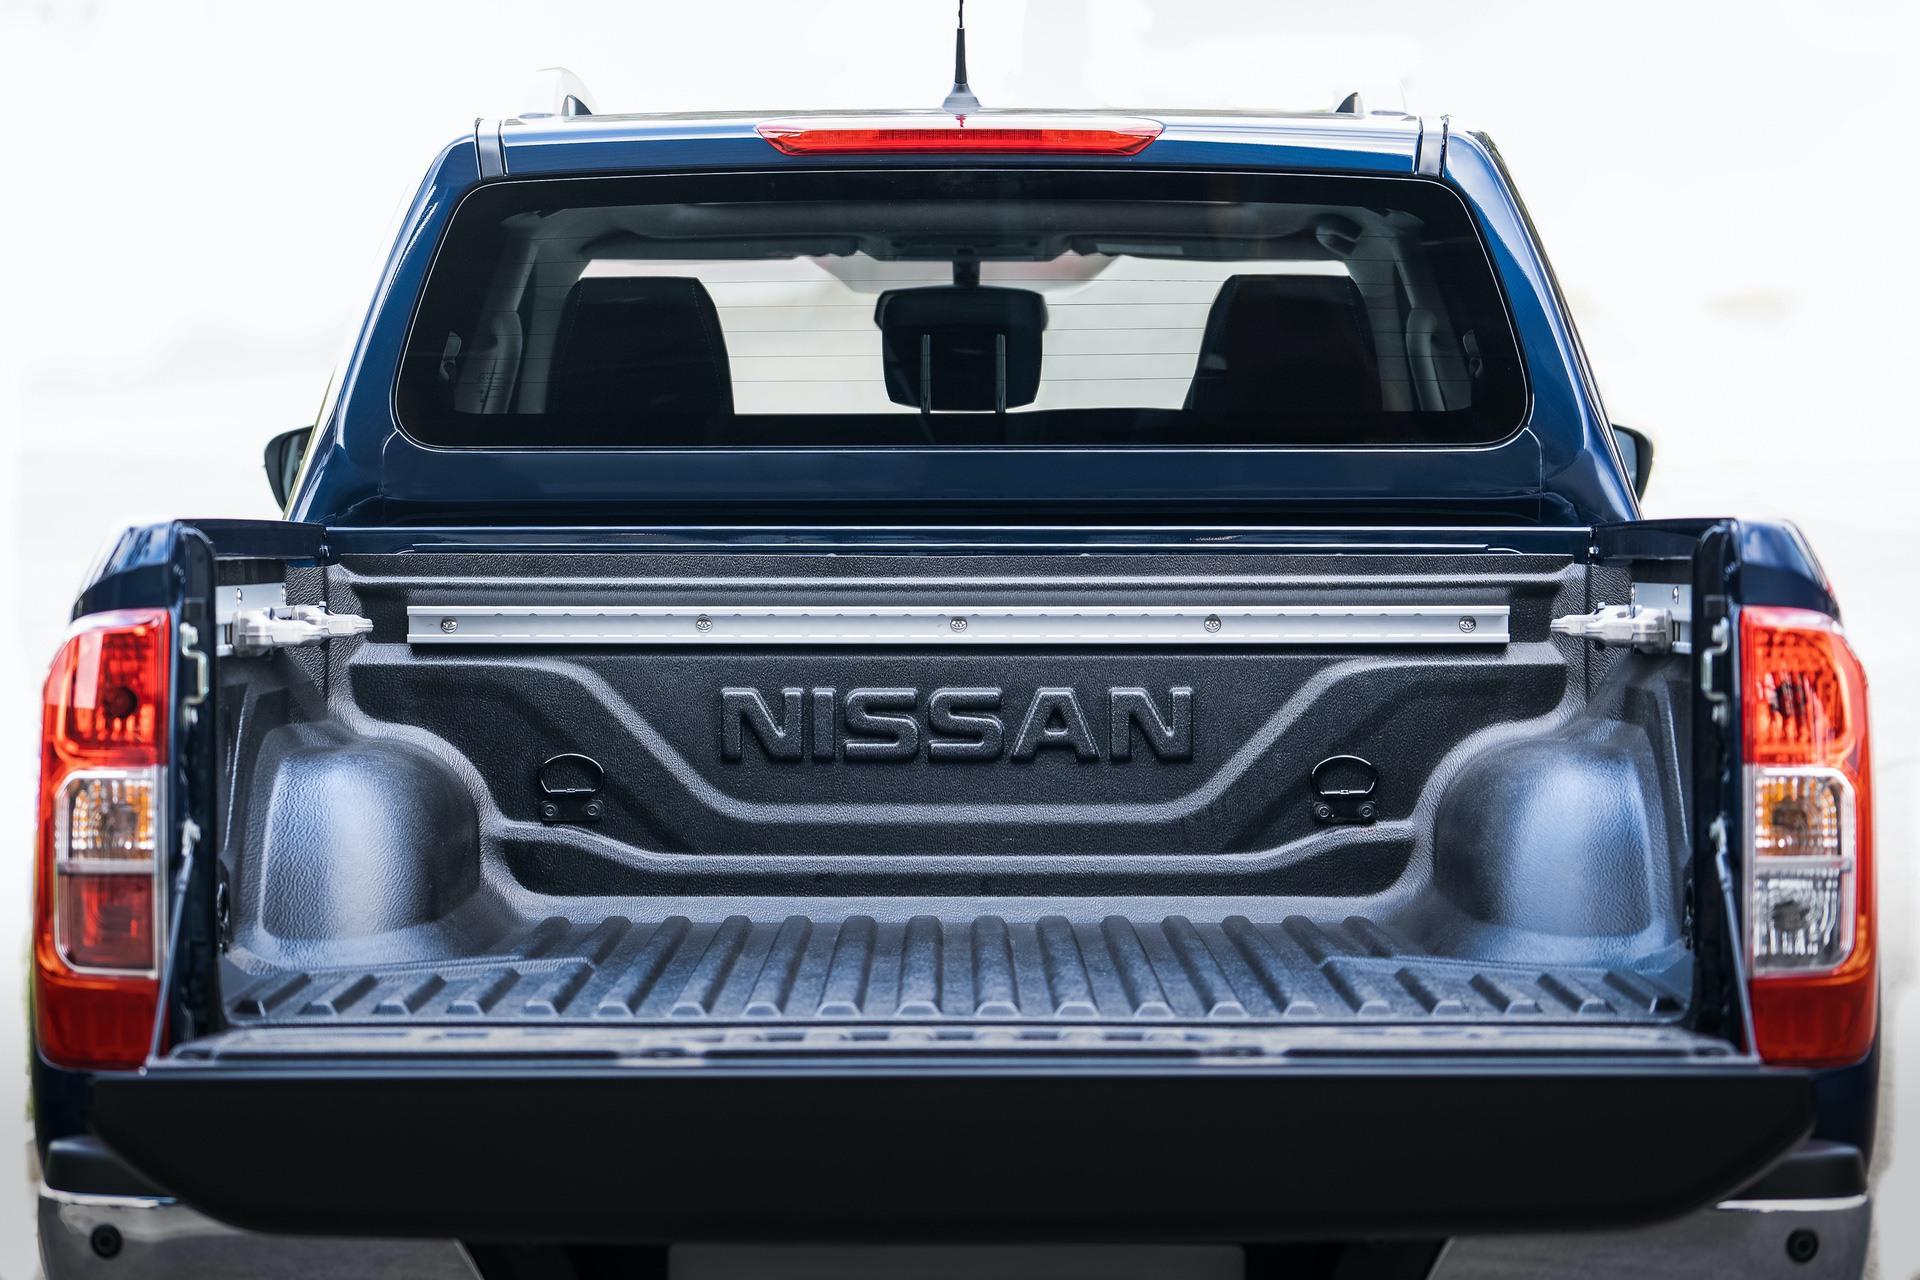 Nissan-Navara-Double-Cab-Blue-Load-area